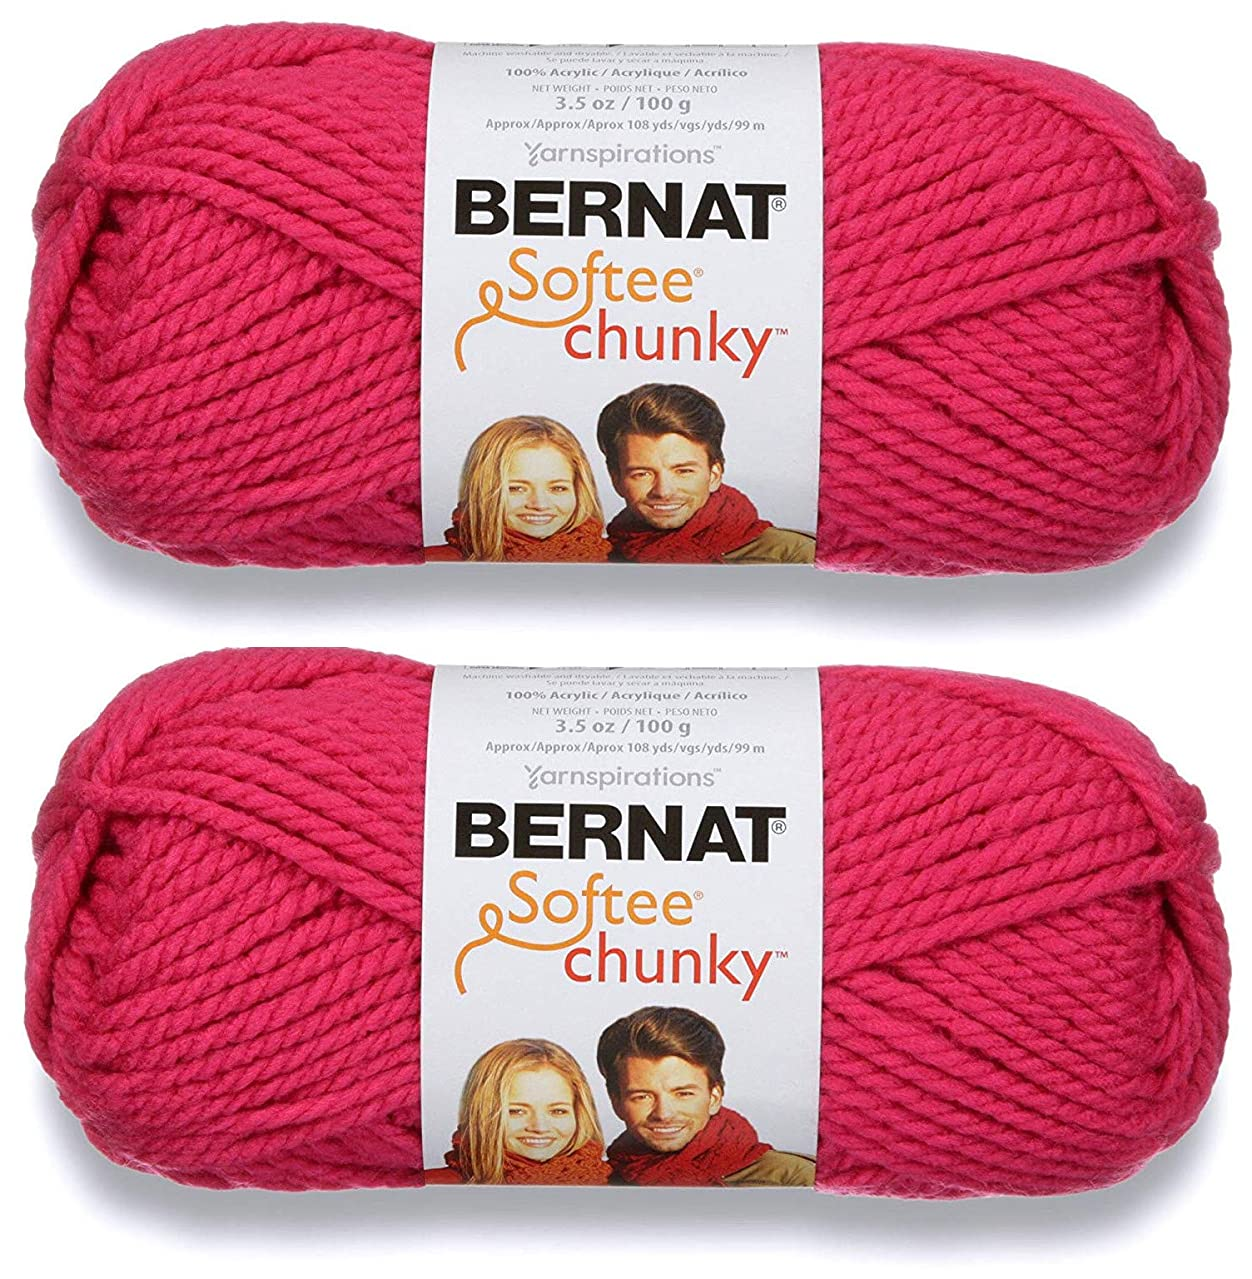 2-Pack - Bernat Softee Chunky Yarn, Hot Pink, Single Ball